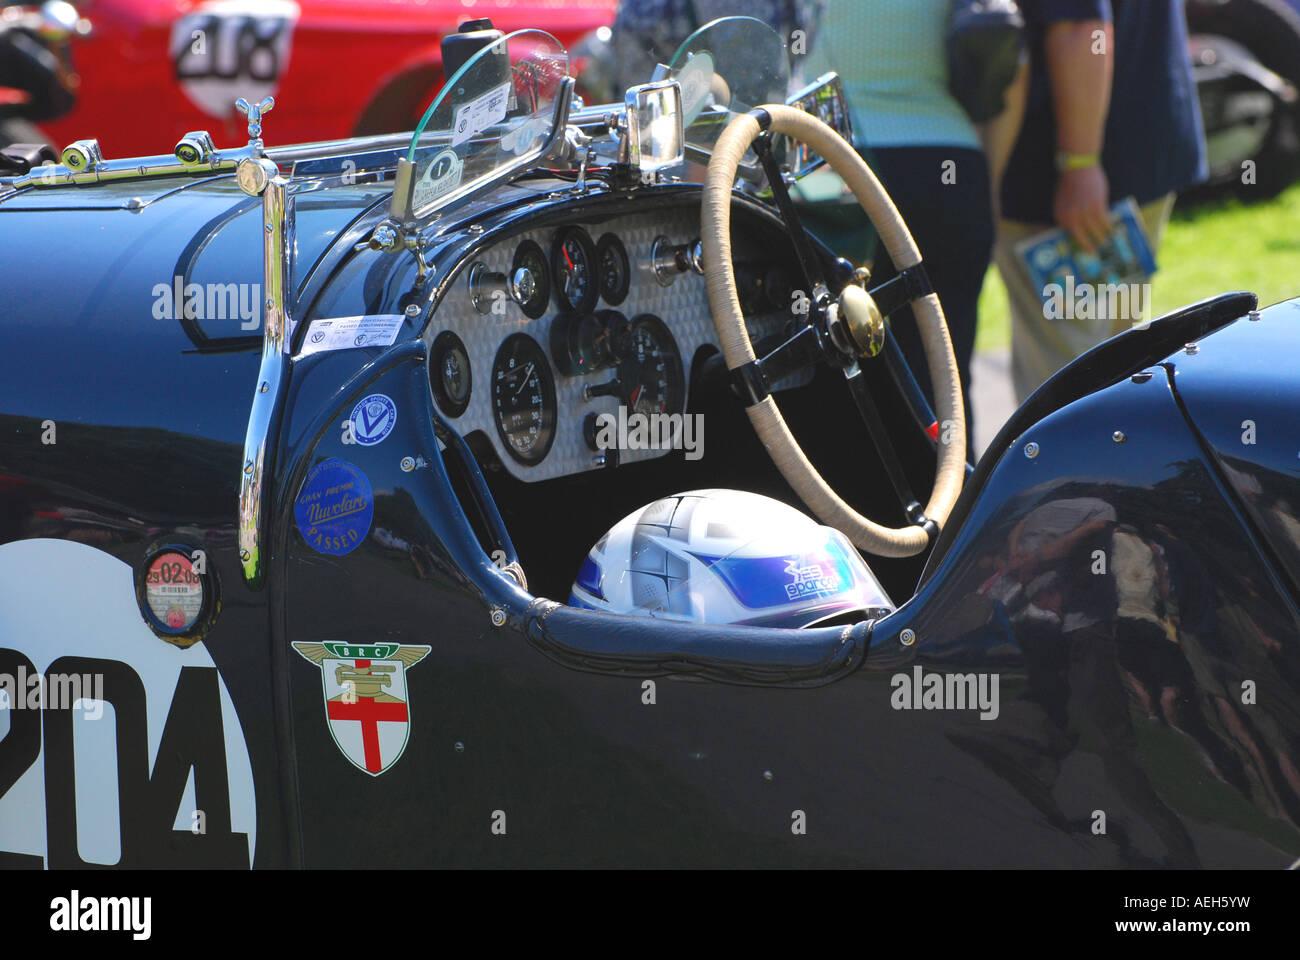 1927 1928 4398 Cc Bentley 3/4.5 Sports 2 Seater At The 2007 Vintage Sports  Car Club Prescott Speed Hill Climb